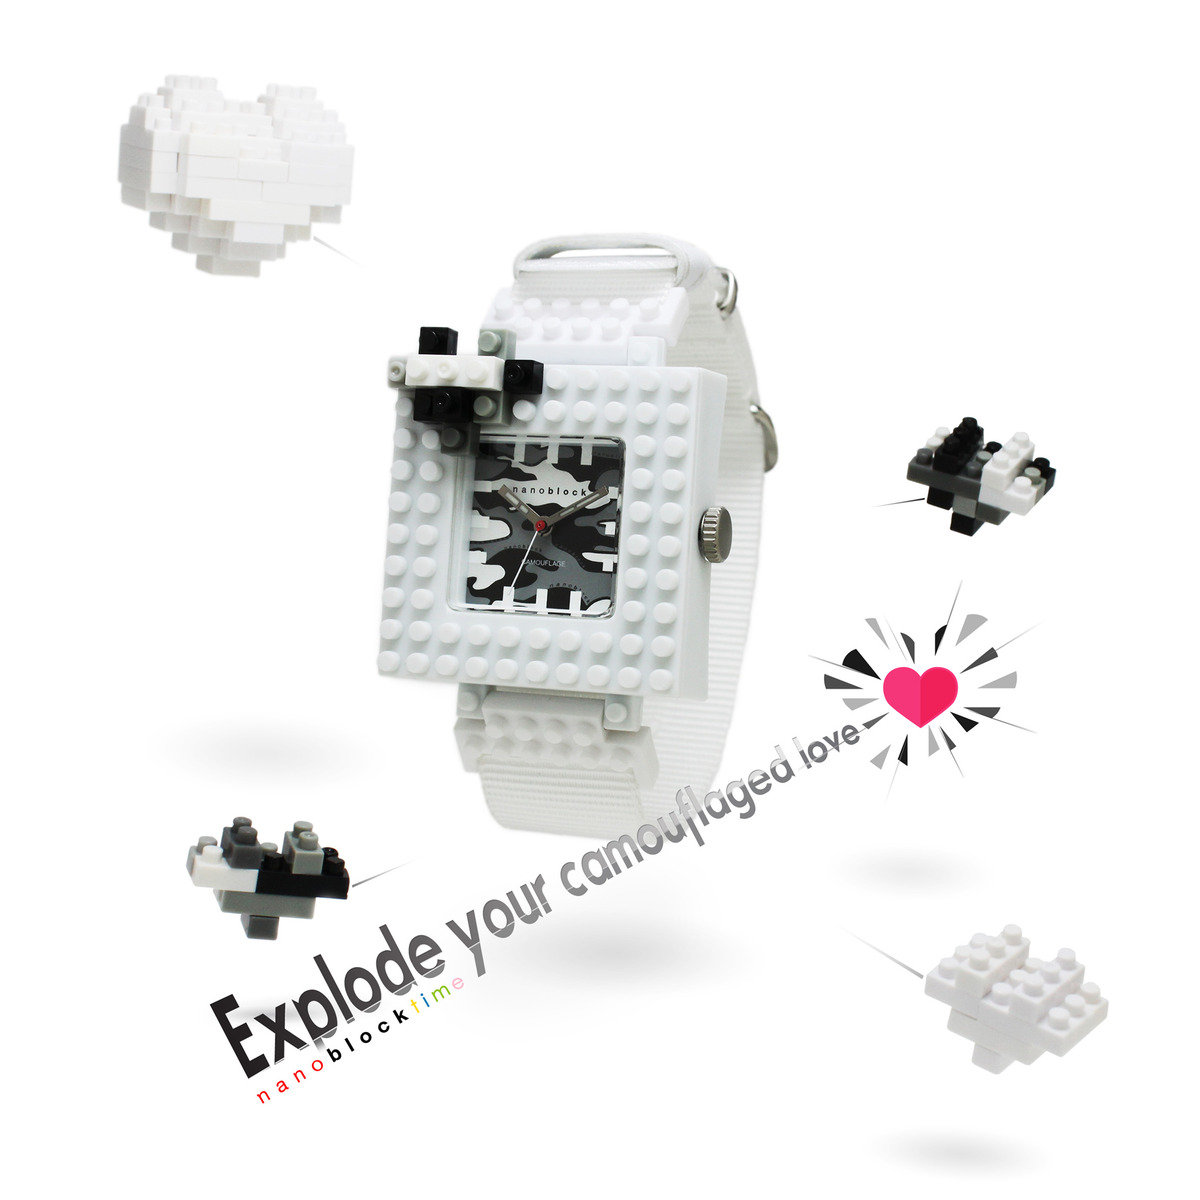 nanoblock DIY *白色情人節特別版* 迷彩手錶盒裝